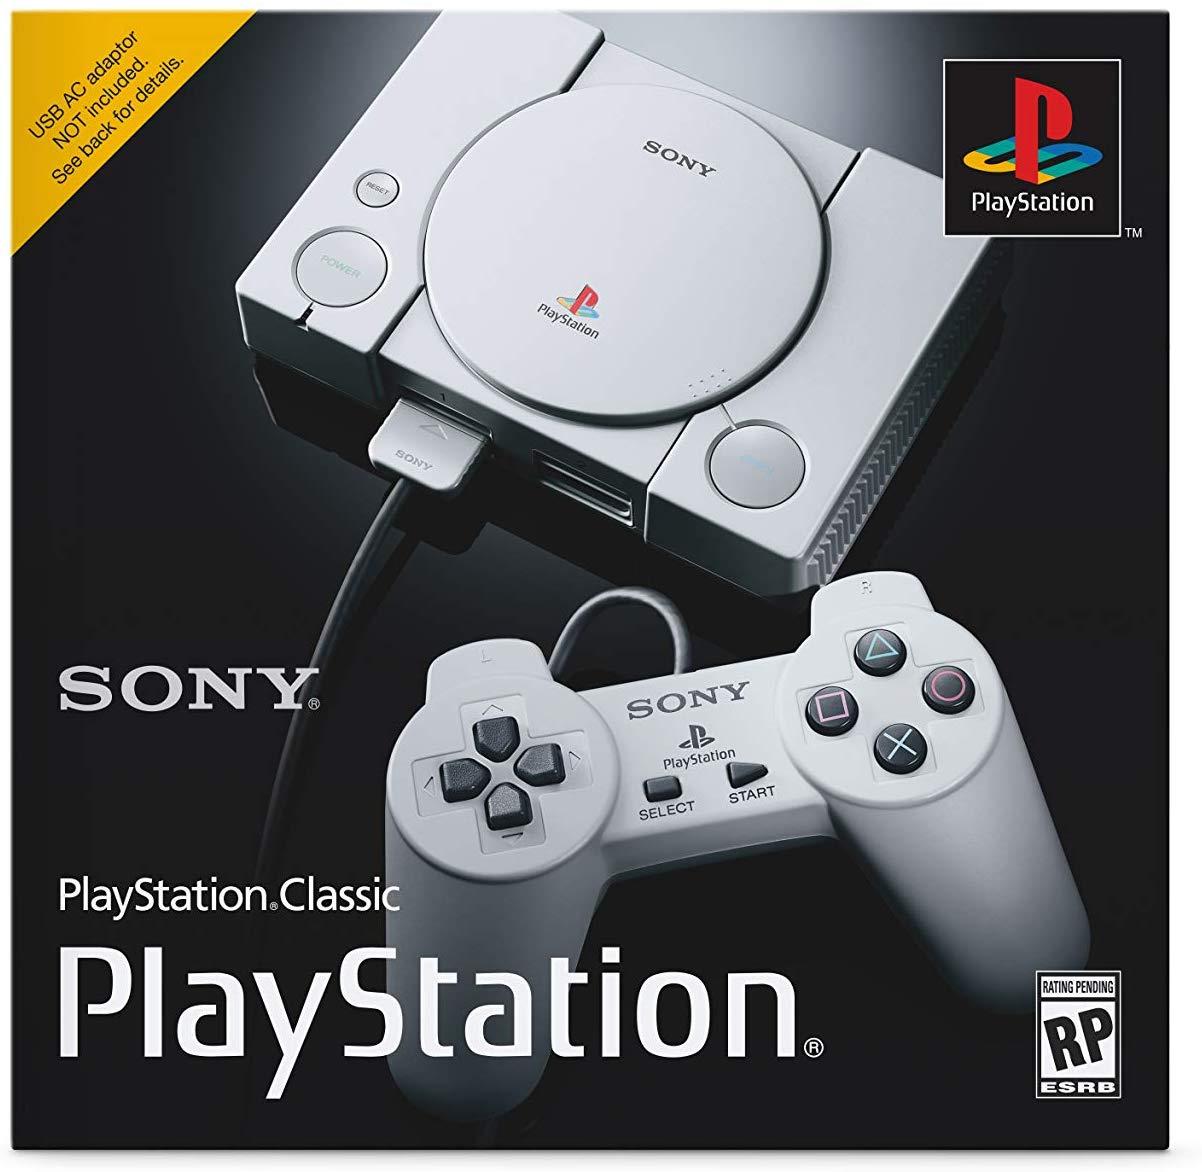 b2f146b339a37 Amazon.com: PlayStation Classic: Video Games